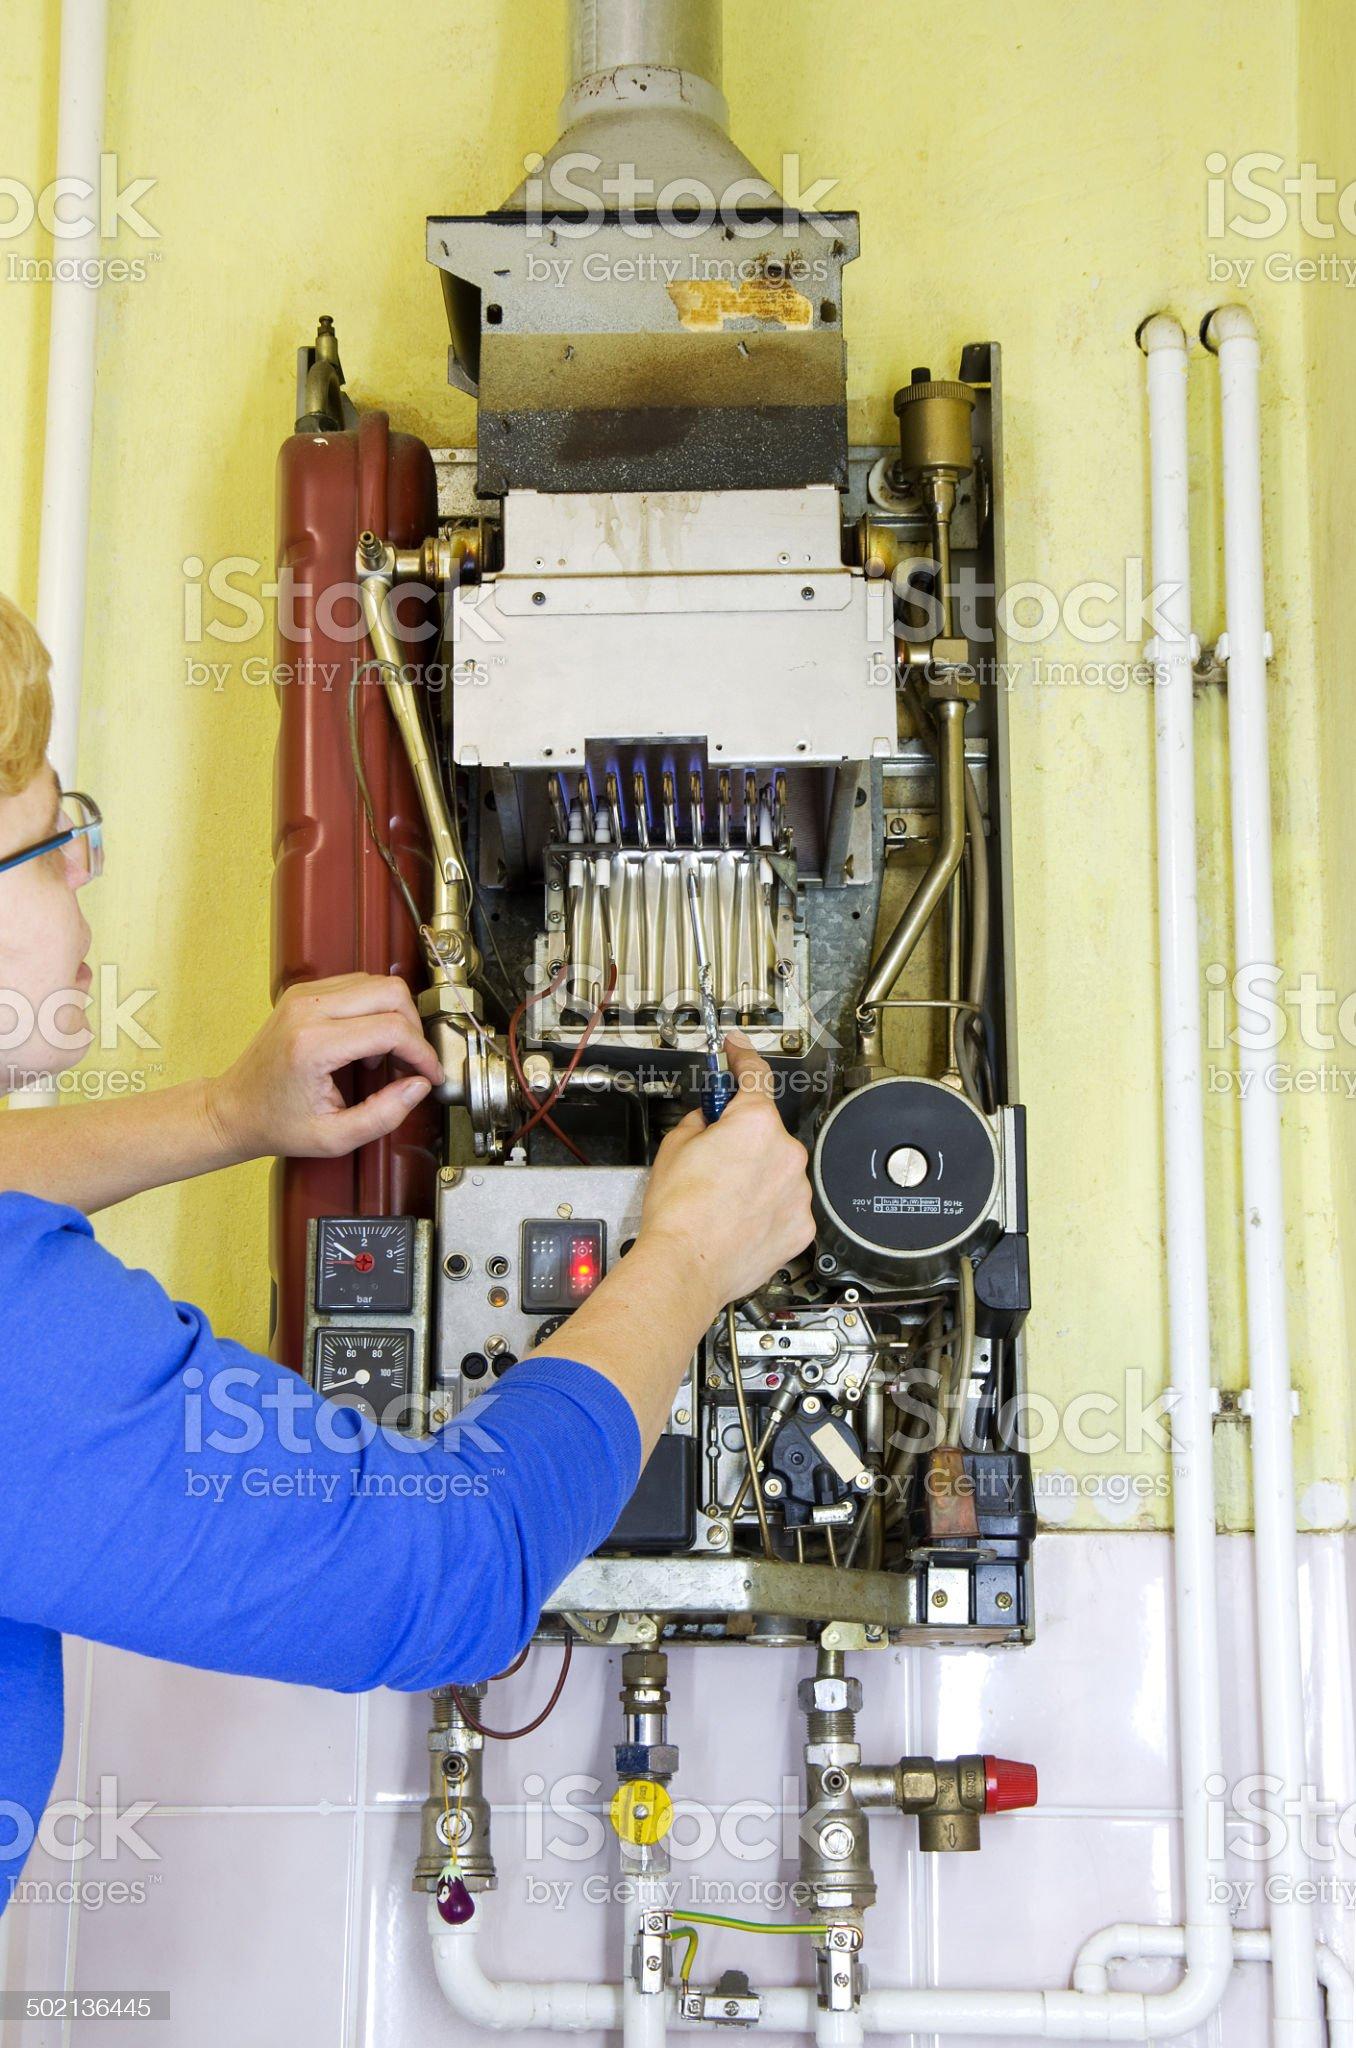 plumber heating screwdriver royalty-free stock photo